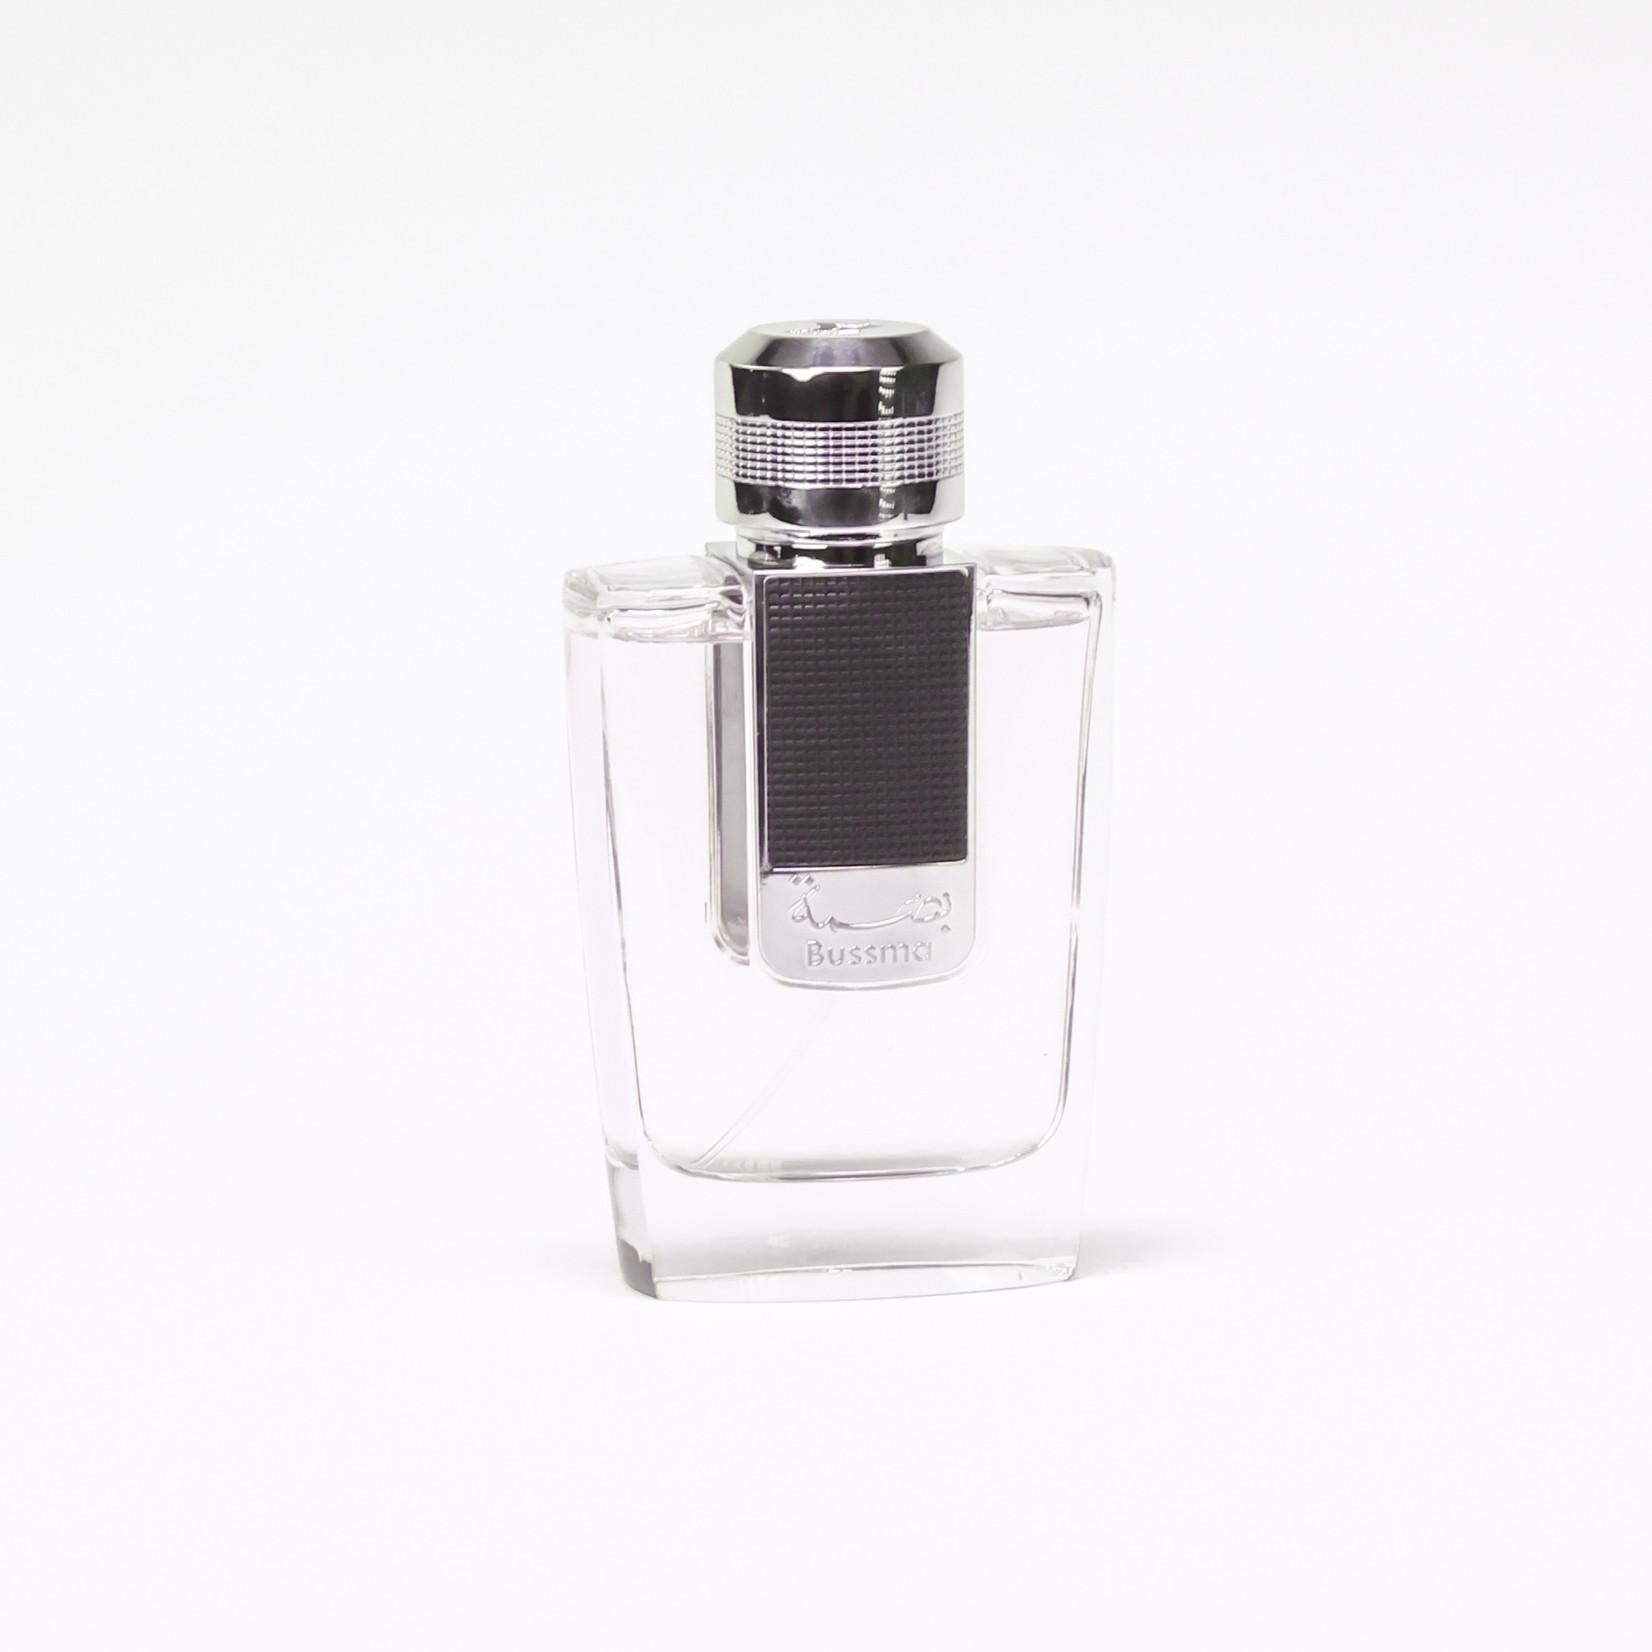 Arabian Oud Bussma (90ML Eau de Parfum)